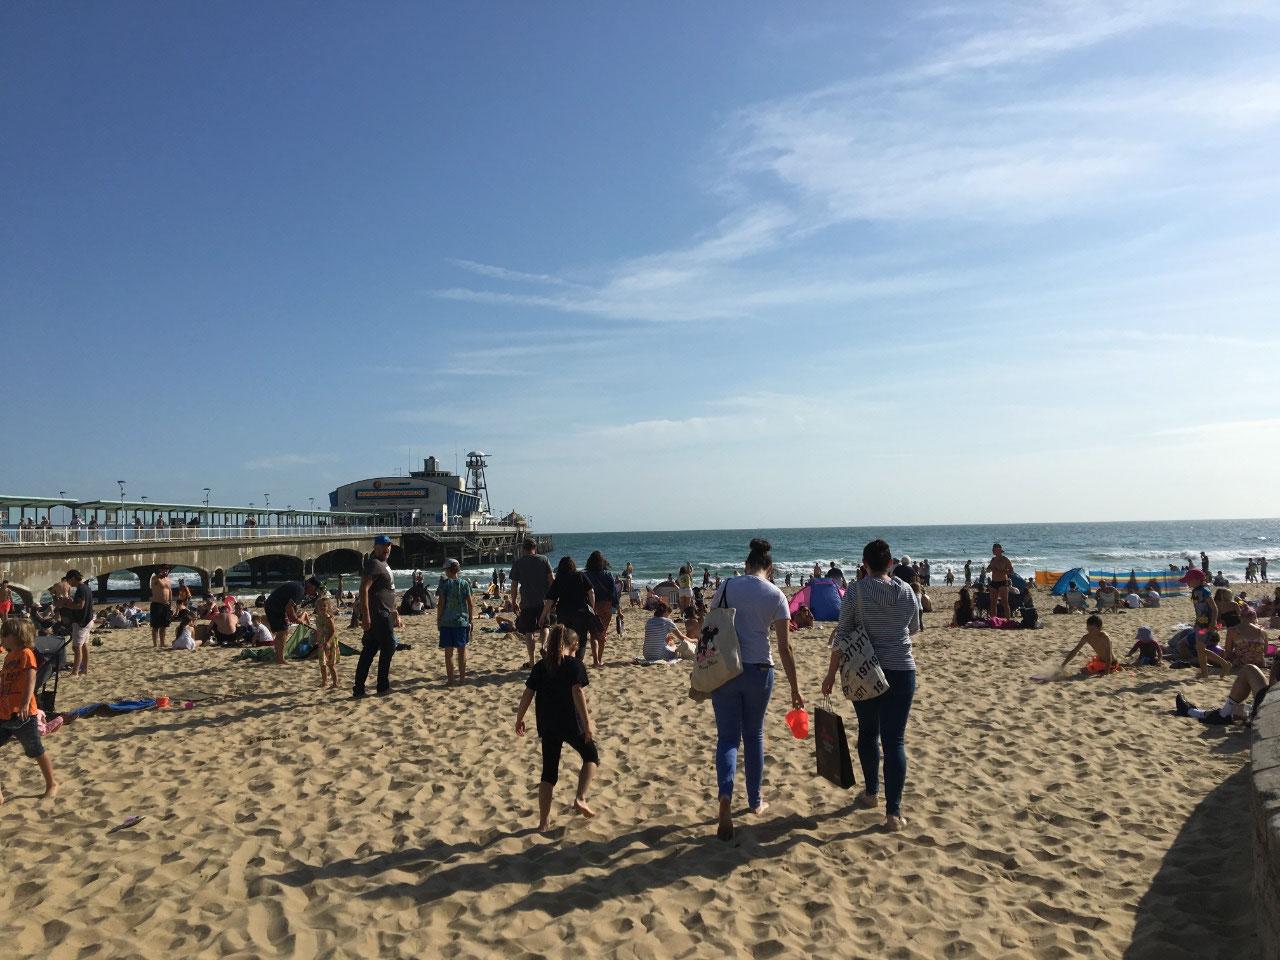 Lots of beach